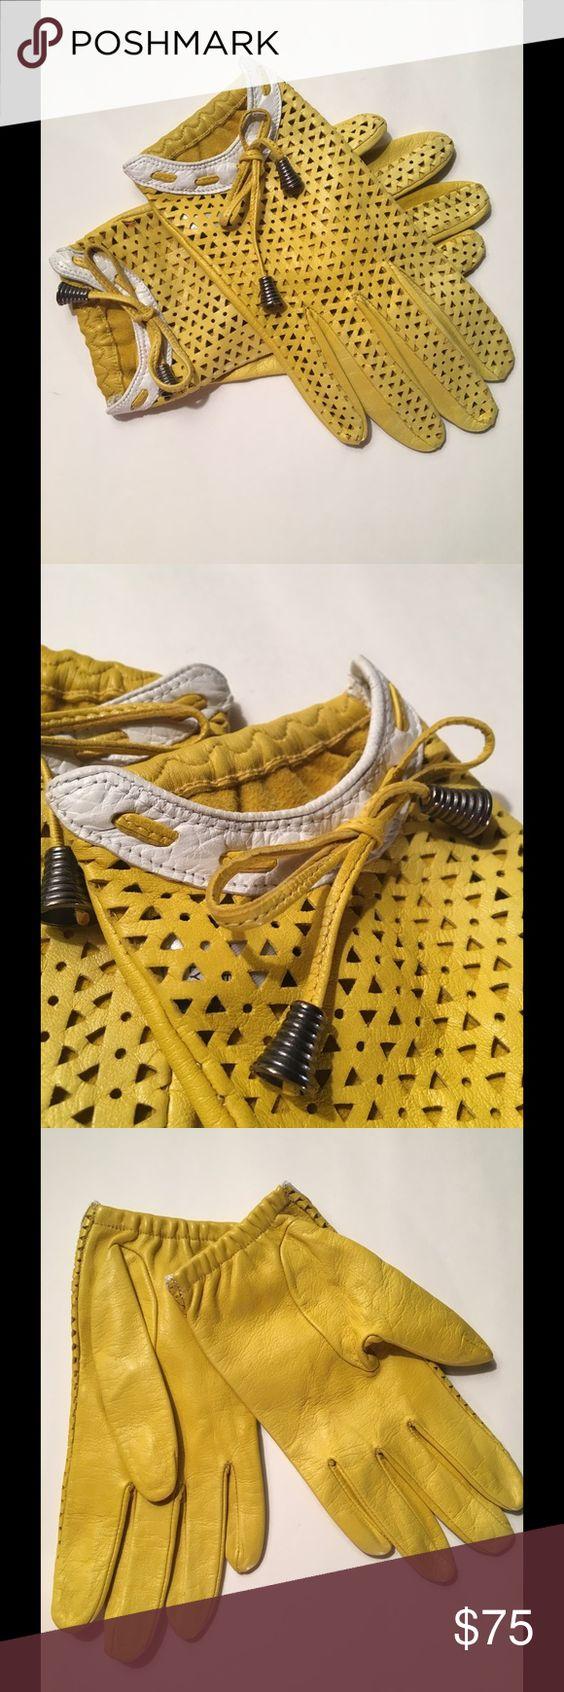 Yellow leather driving gloves - Sermoneta Leather Ladies Driving Gloves Adorable Sermoneta Ladies Leather Driving Gloves In Bright Fun Yellow